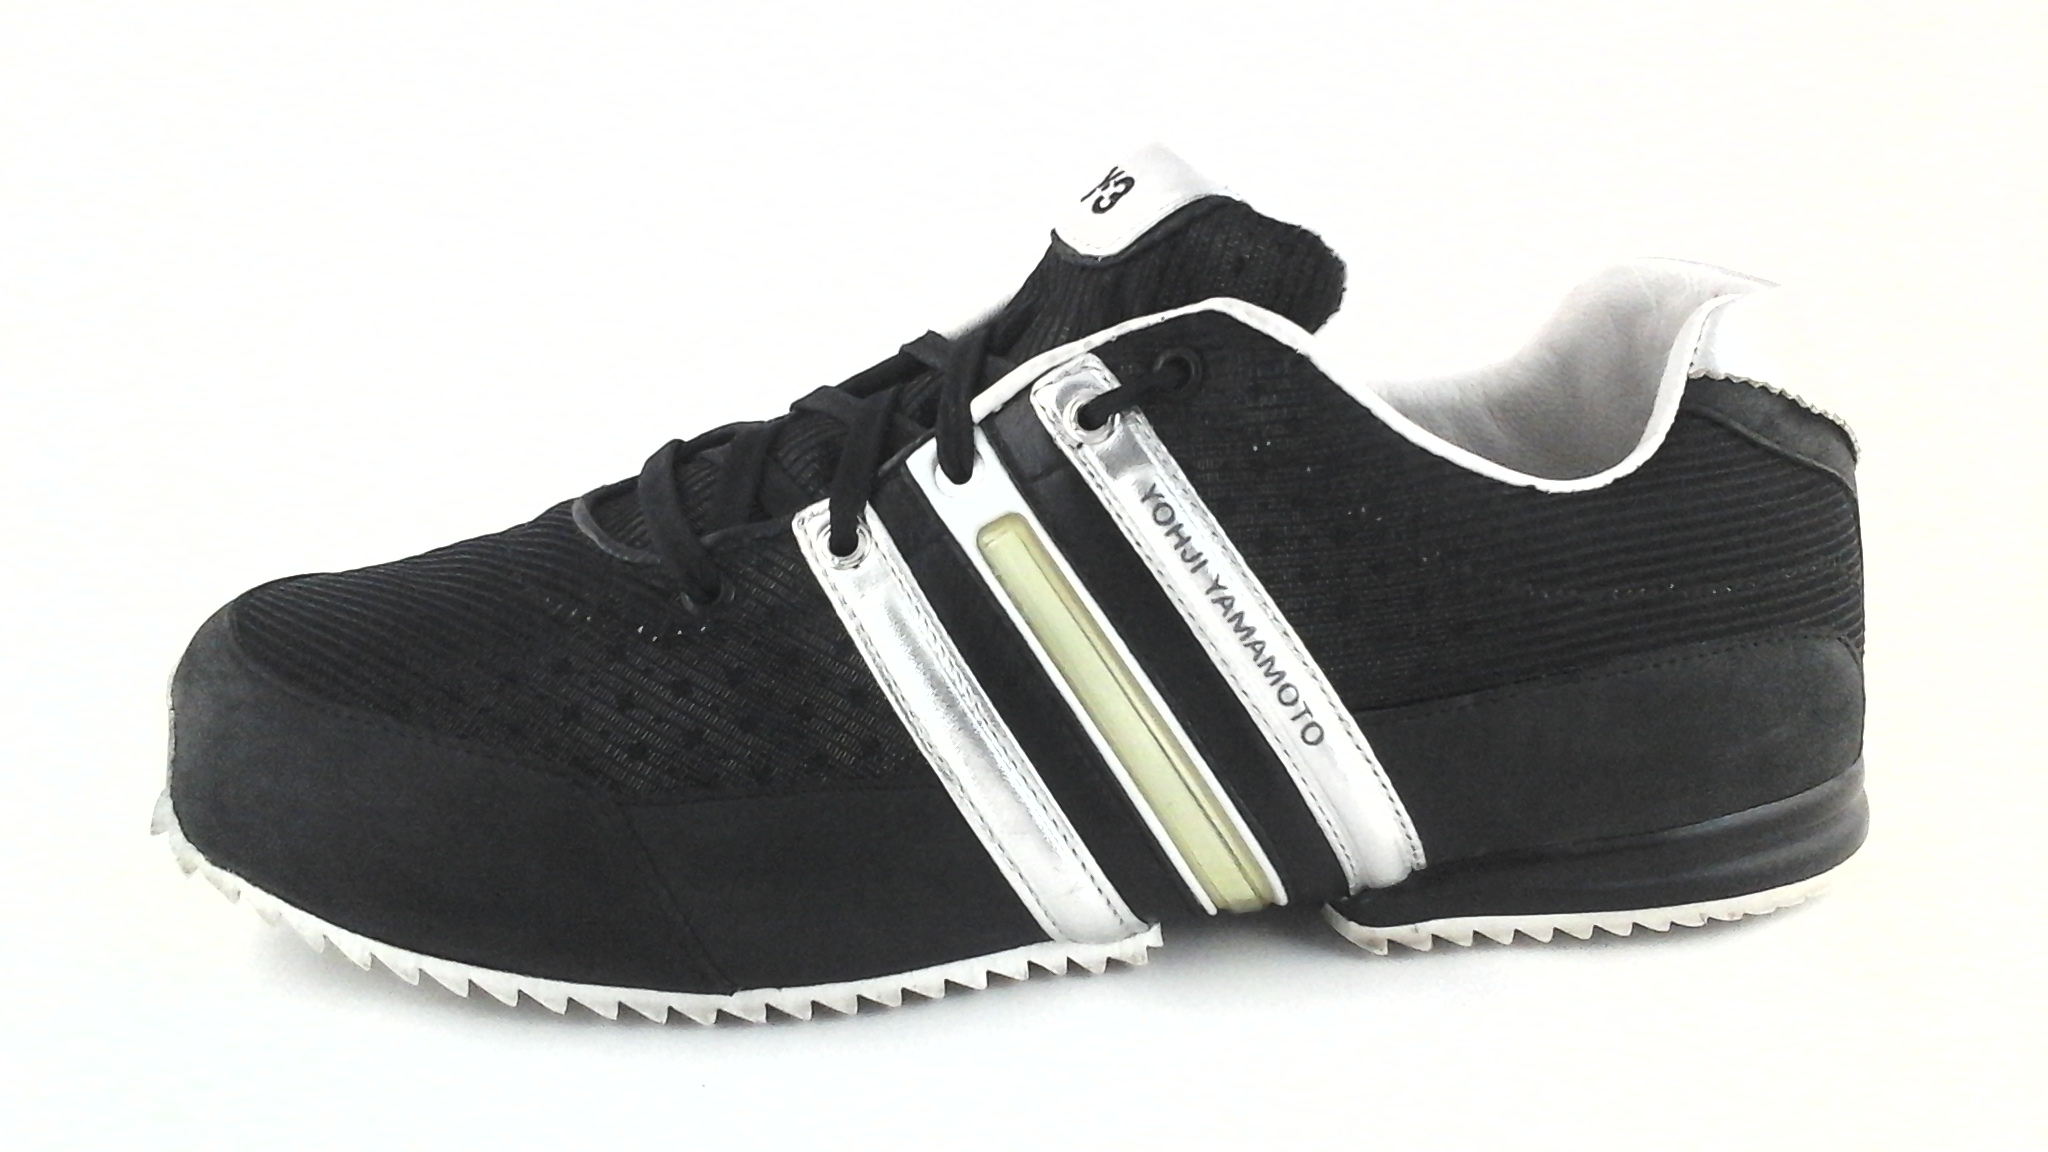 3c2815572ea9 ADIDAS Y-3 Yohji Yamamoto Sprint Black Silver SNEAKERS Shoes US 8 EU 41 1 3   320